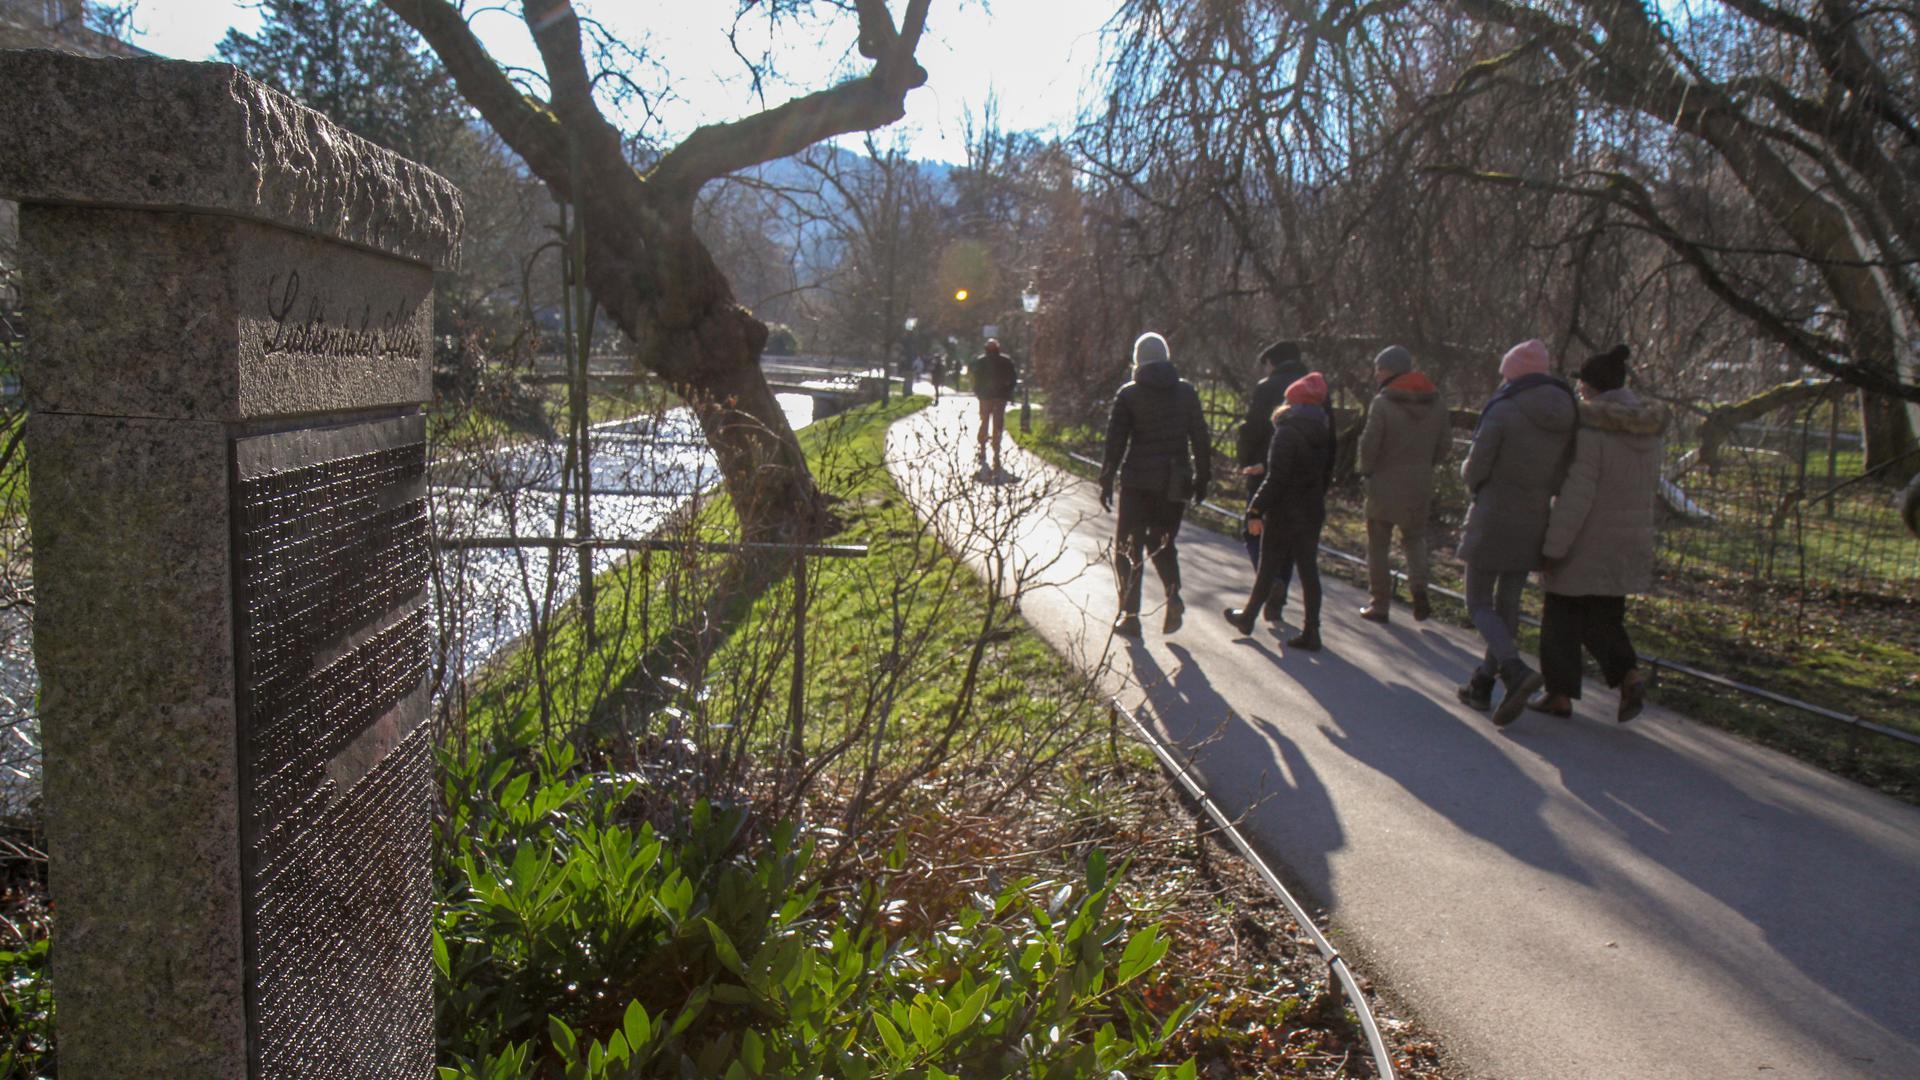 Menschen laufen entlang der Lichtentaler Allee in Baden-Baden.